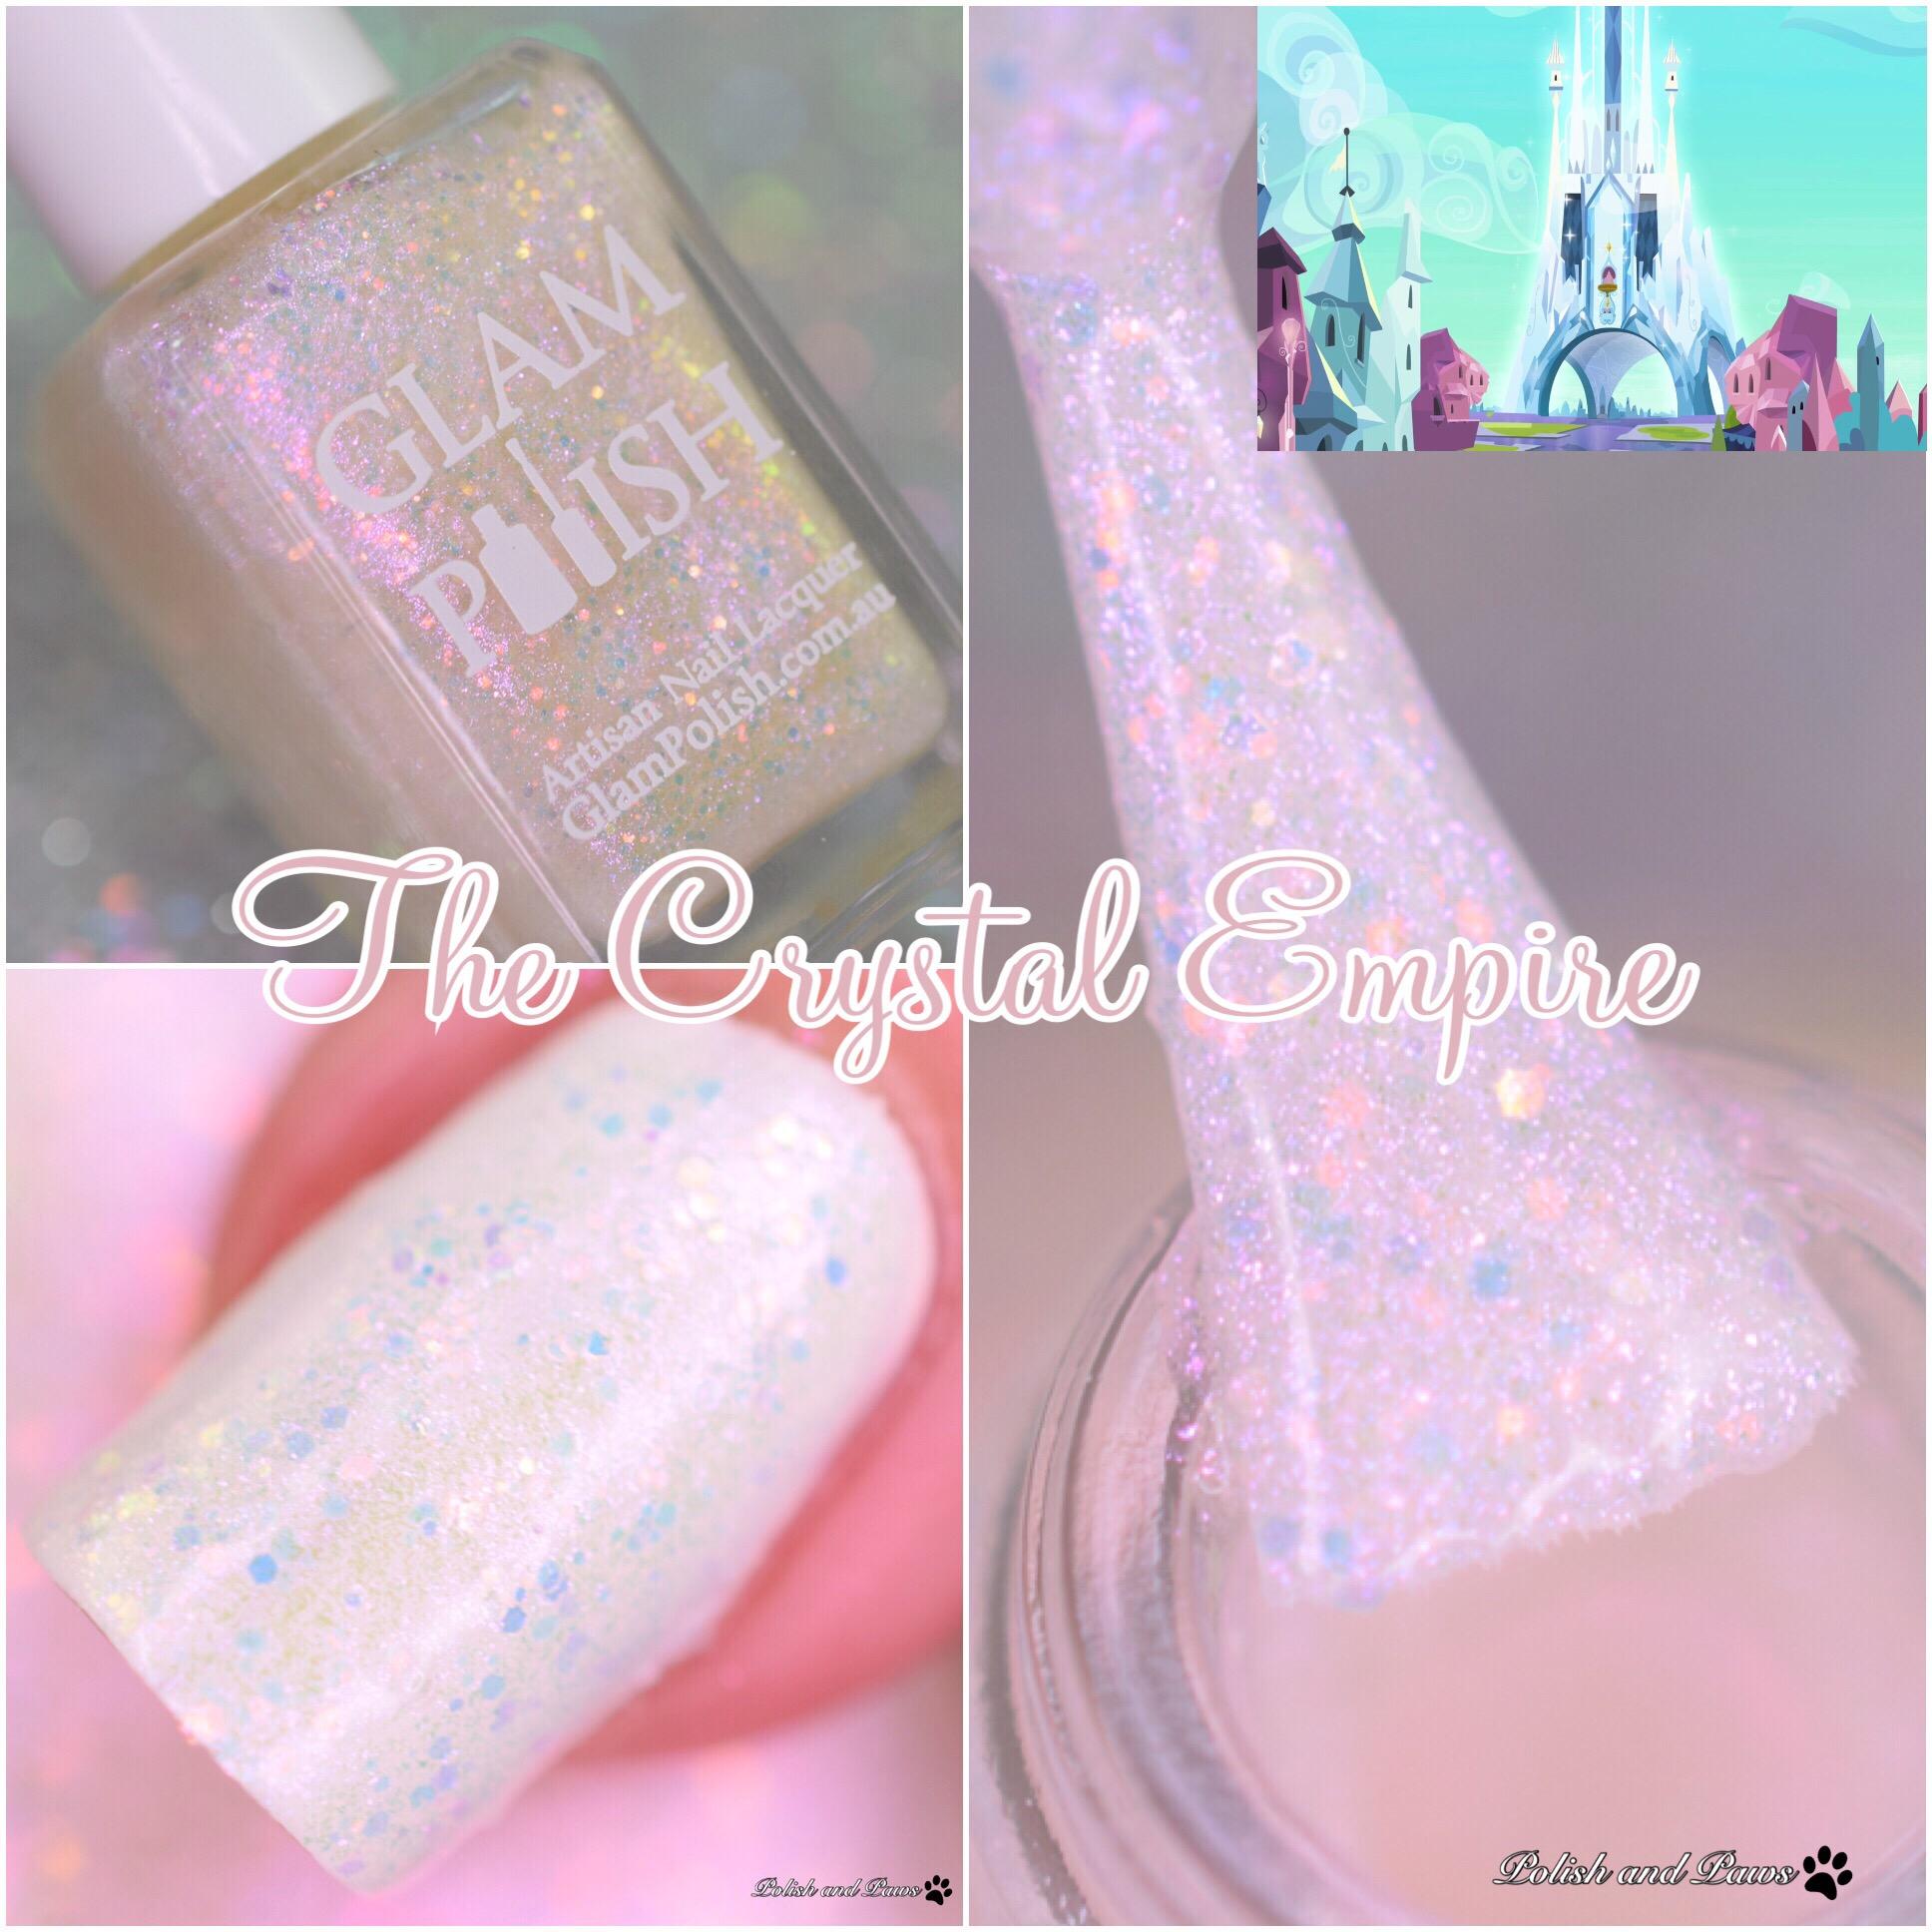 Glam Polish The Crystal Empire